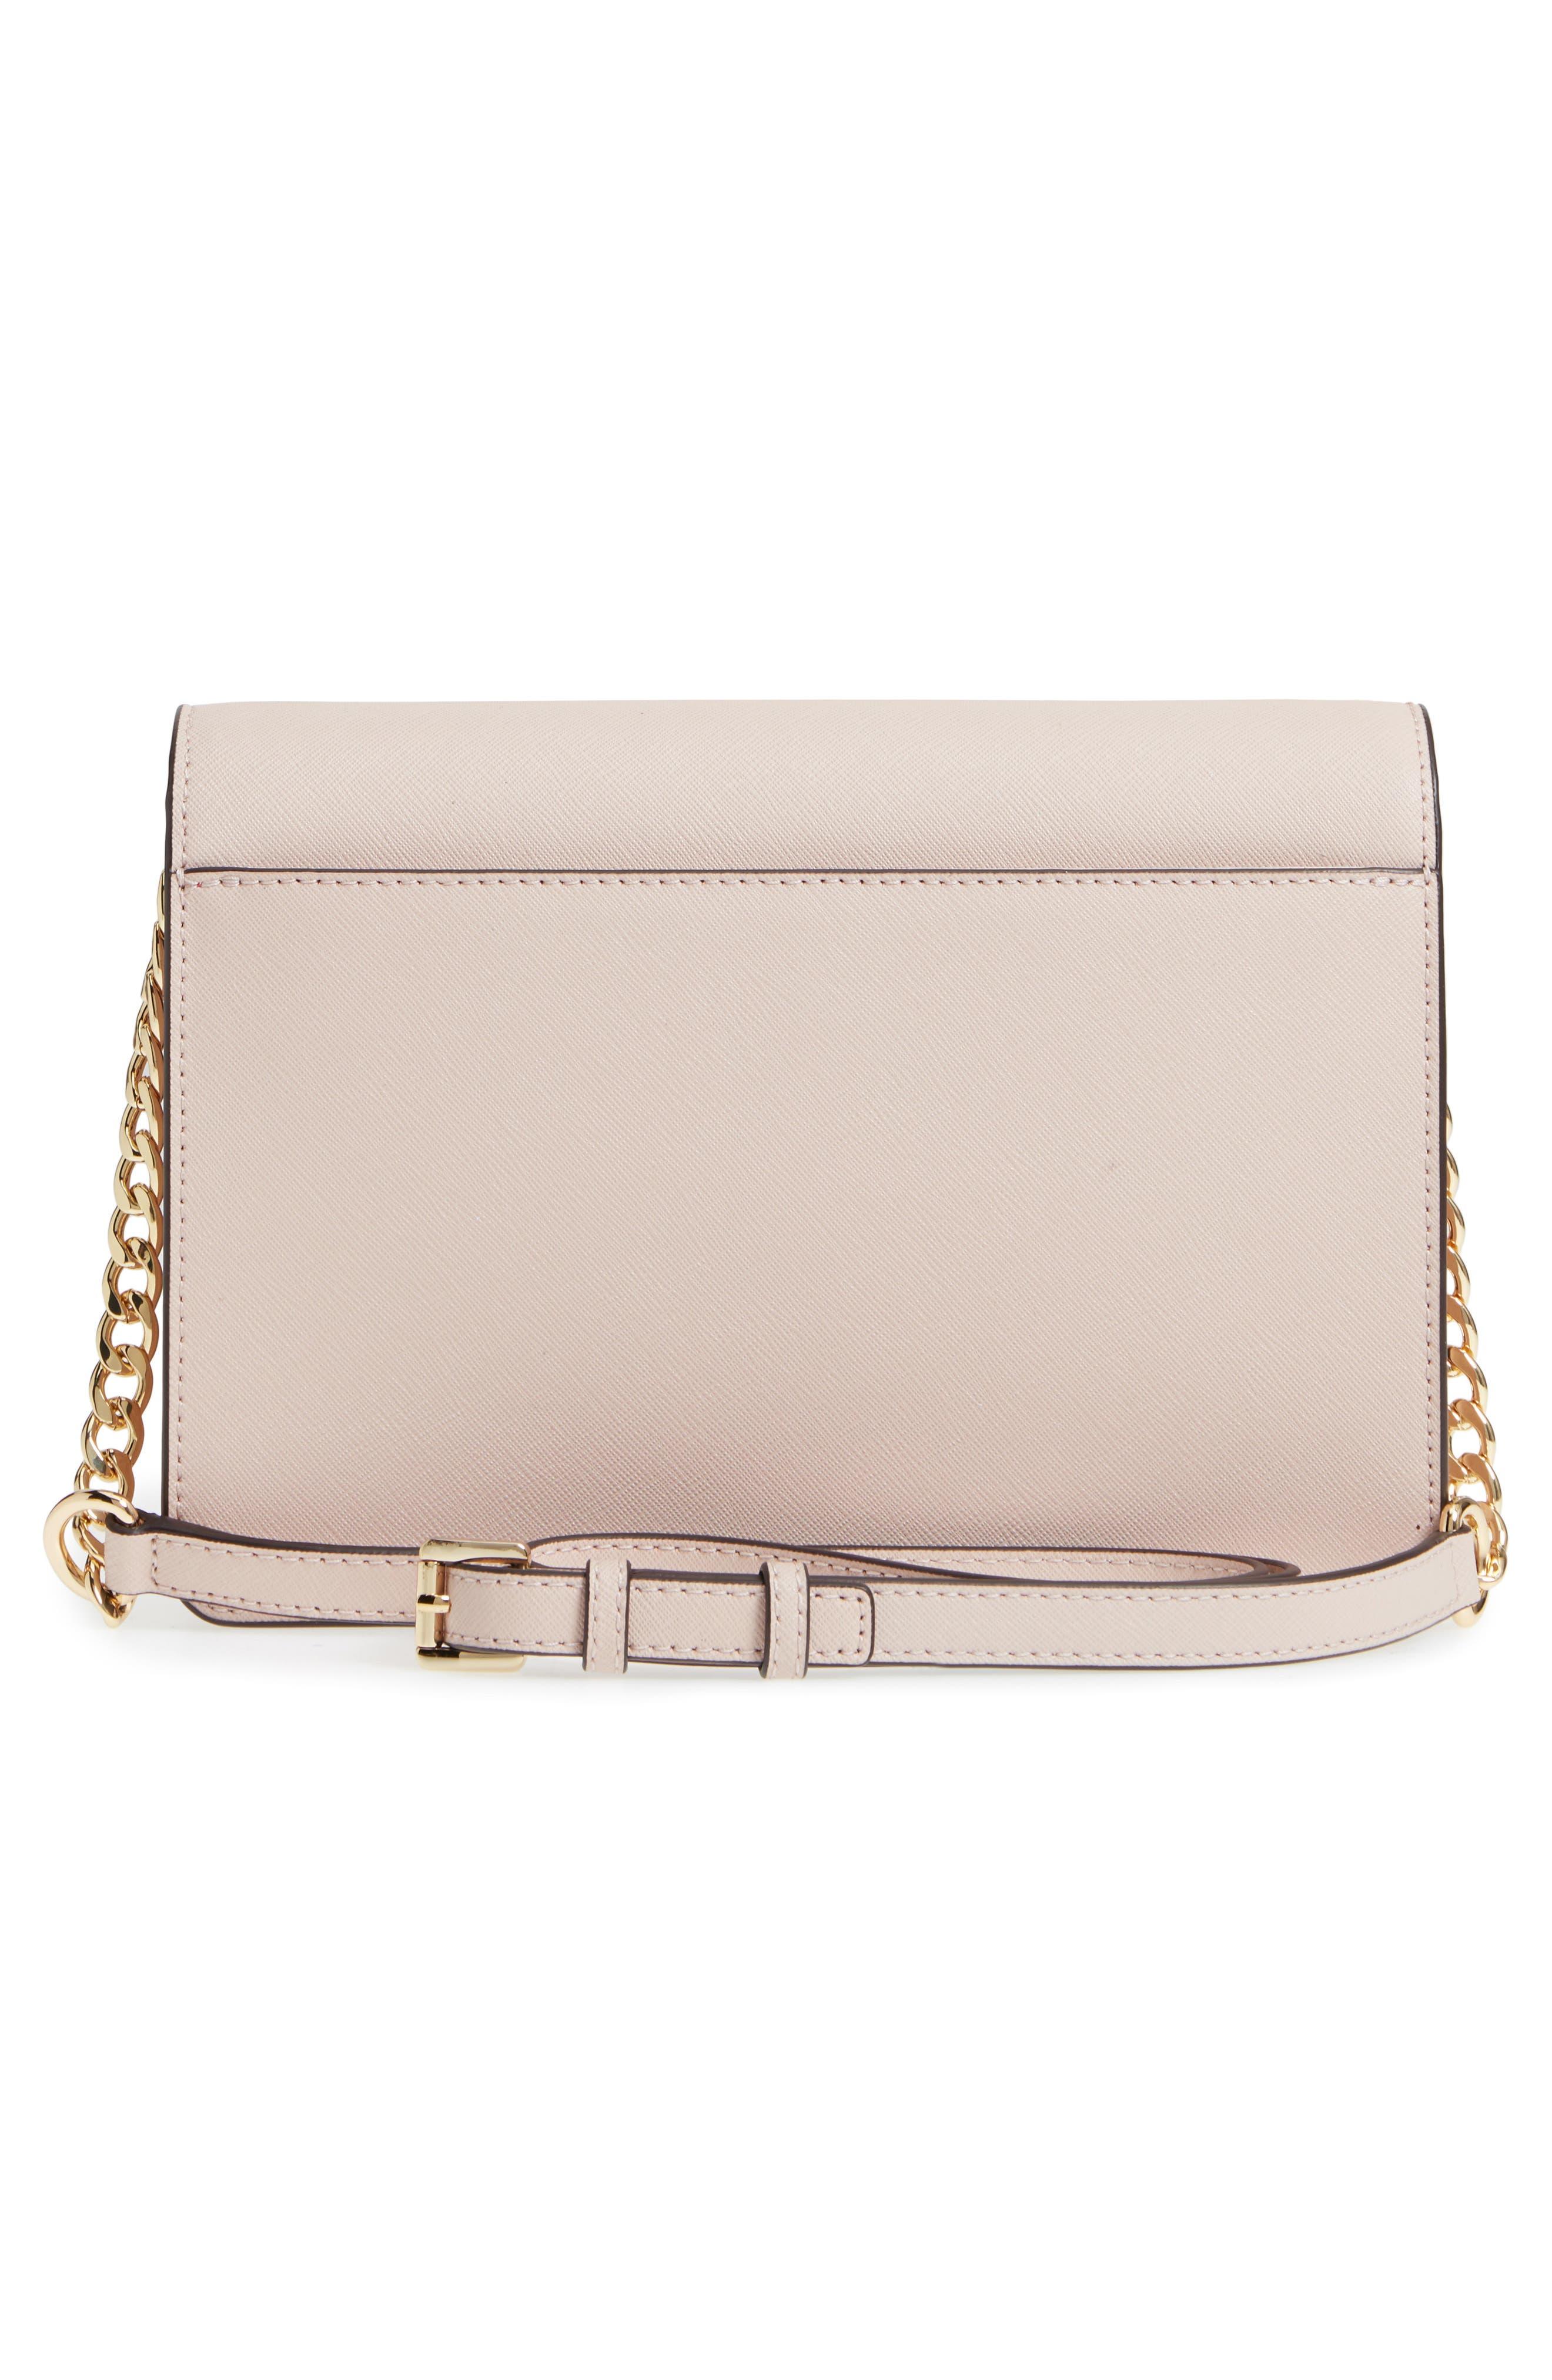 Large Daniela Leather Crossbody Bag,                             Alternate thumbnail 3, color,                             SOFT PINK